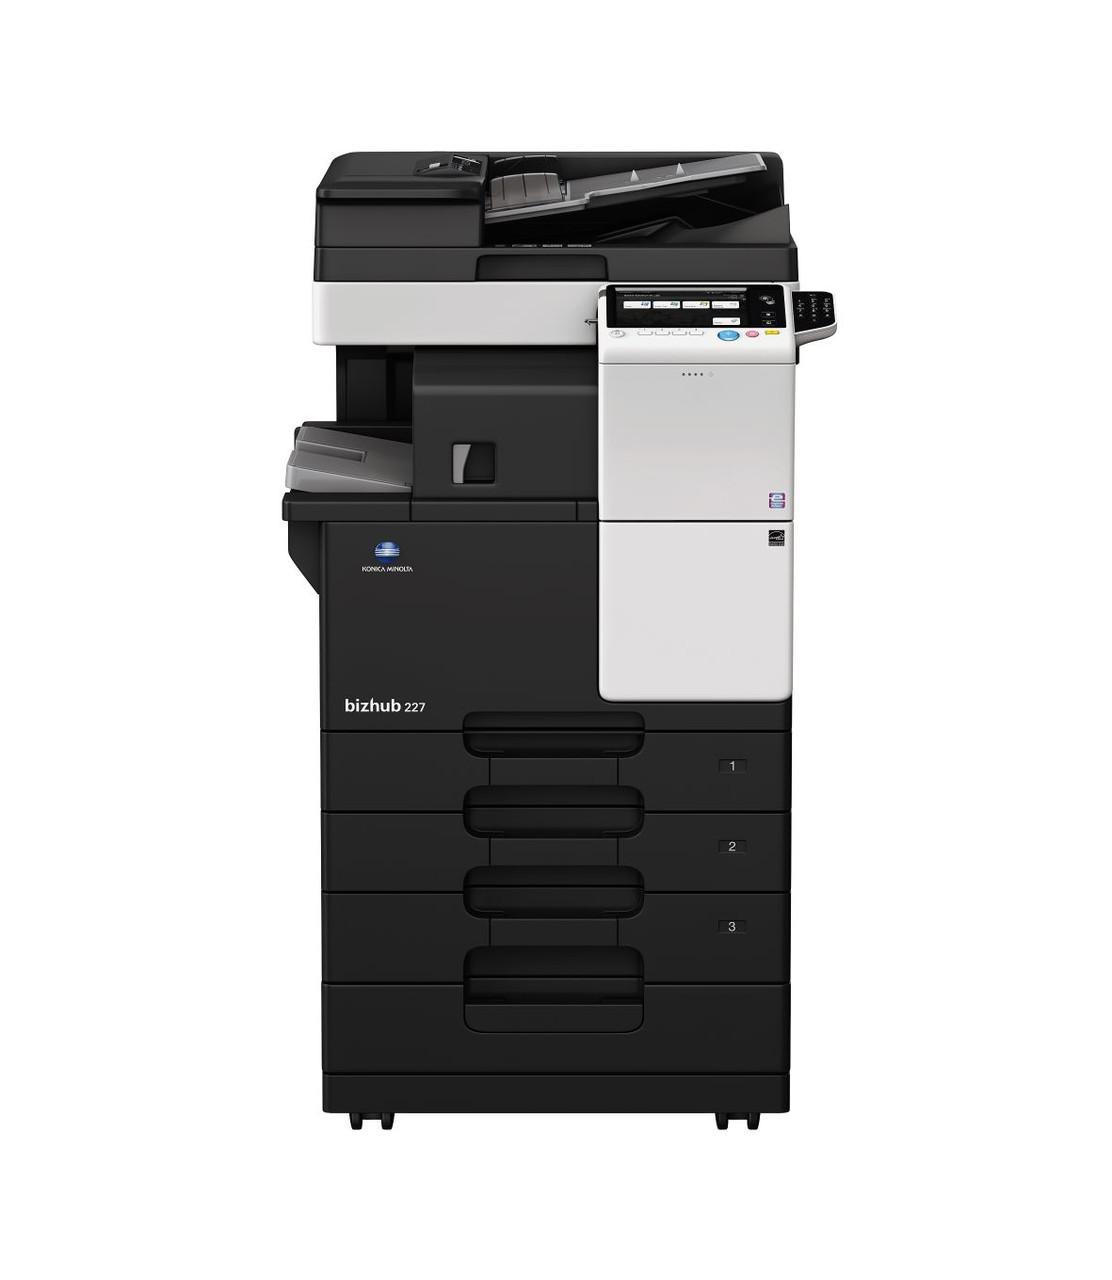 Konica Minolta bizhub 227, монохромное МФУ, А3, 22 стр./мин, копир, сетевой принтер, сканер, дуплекс